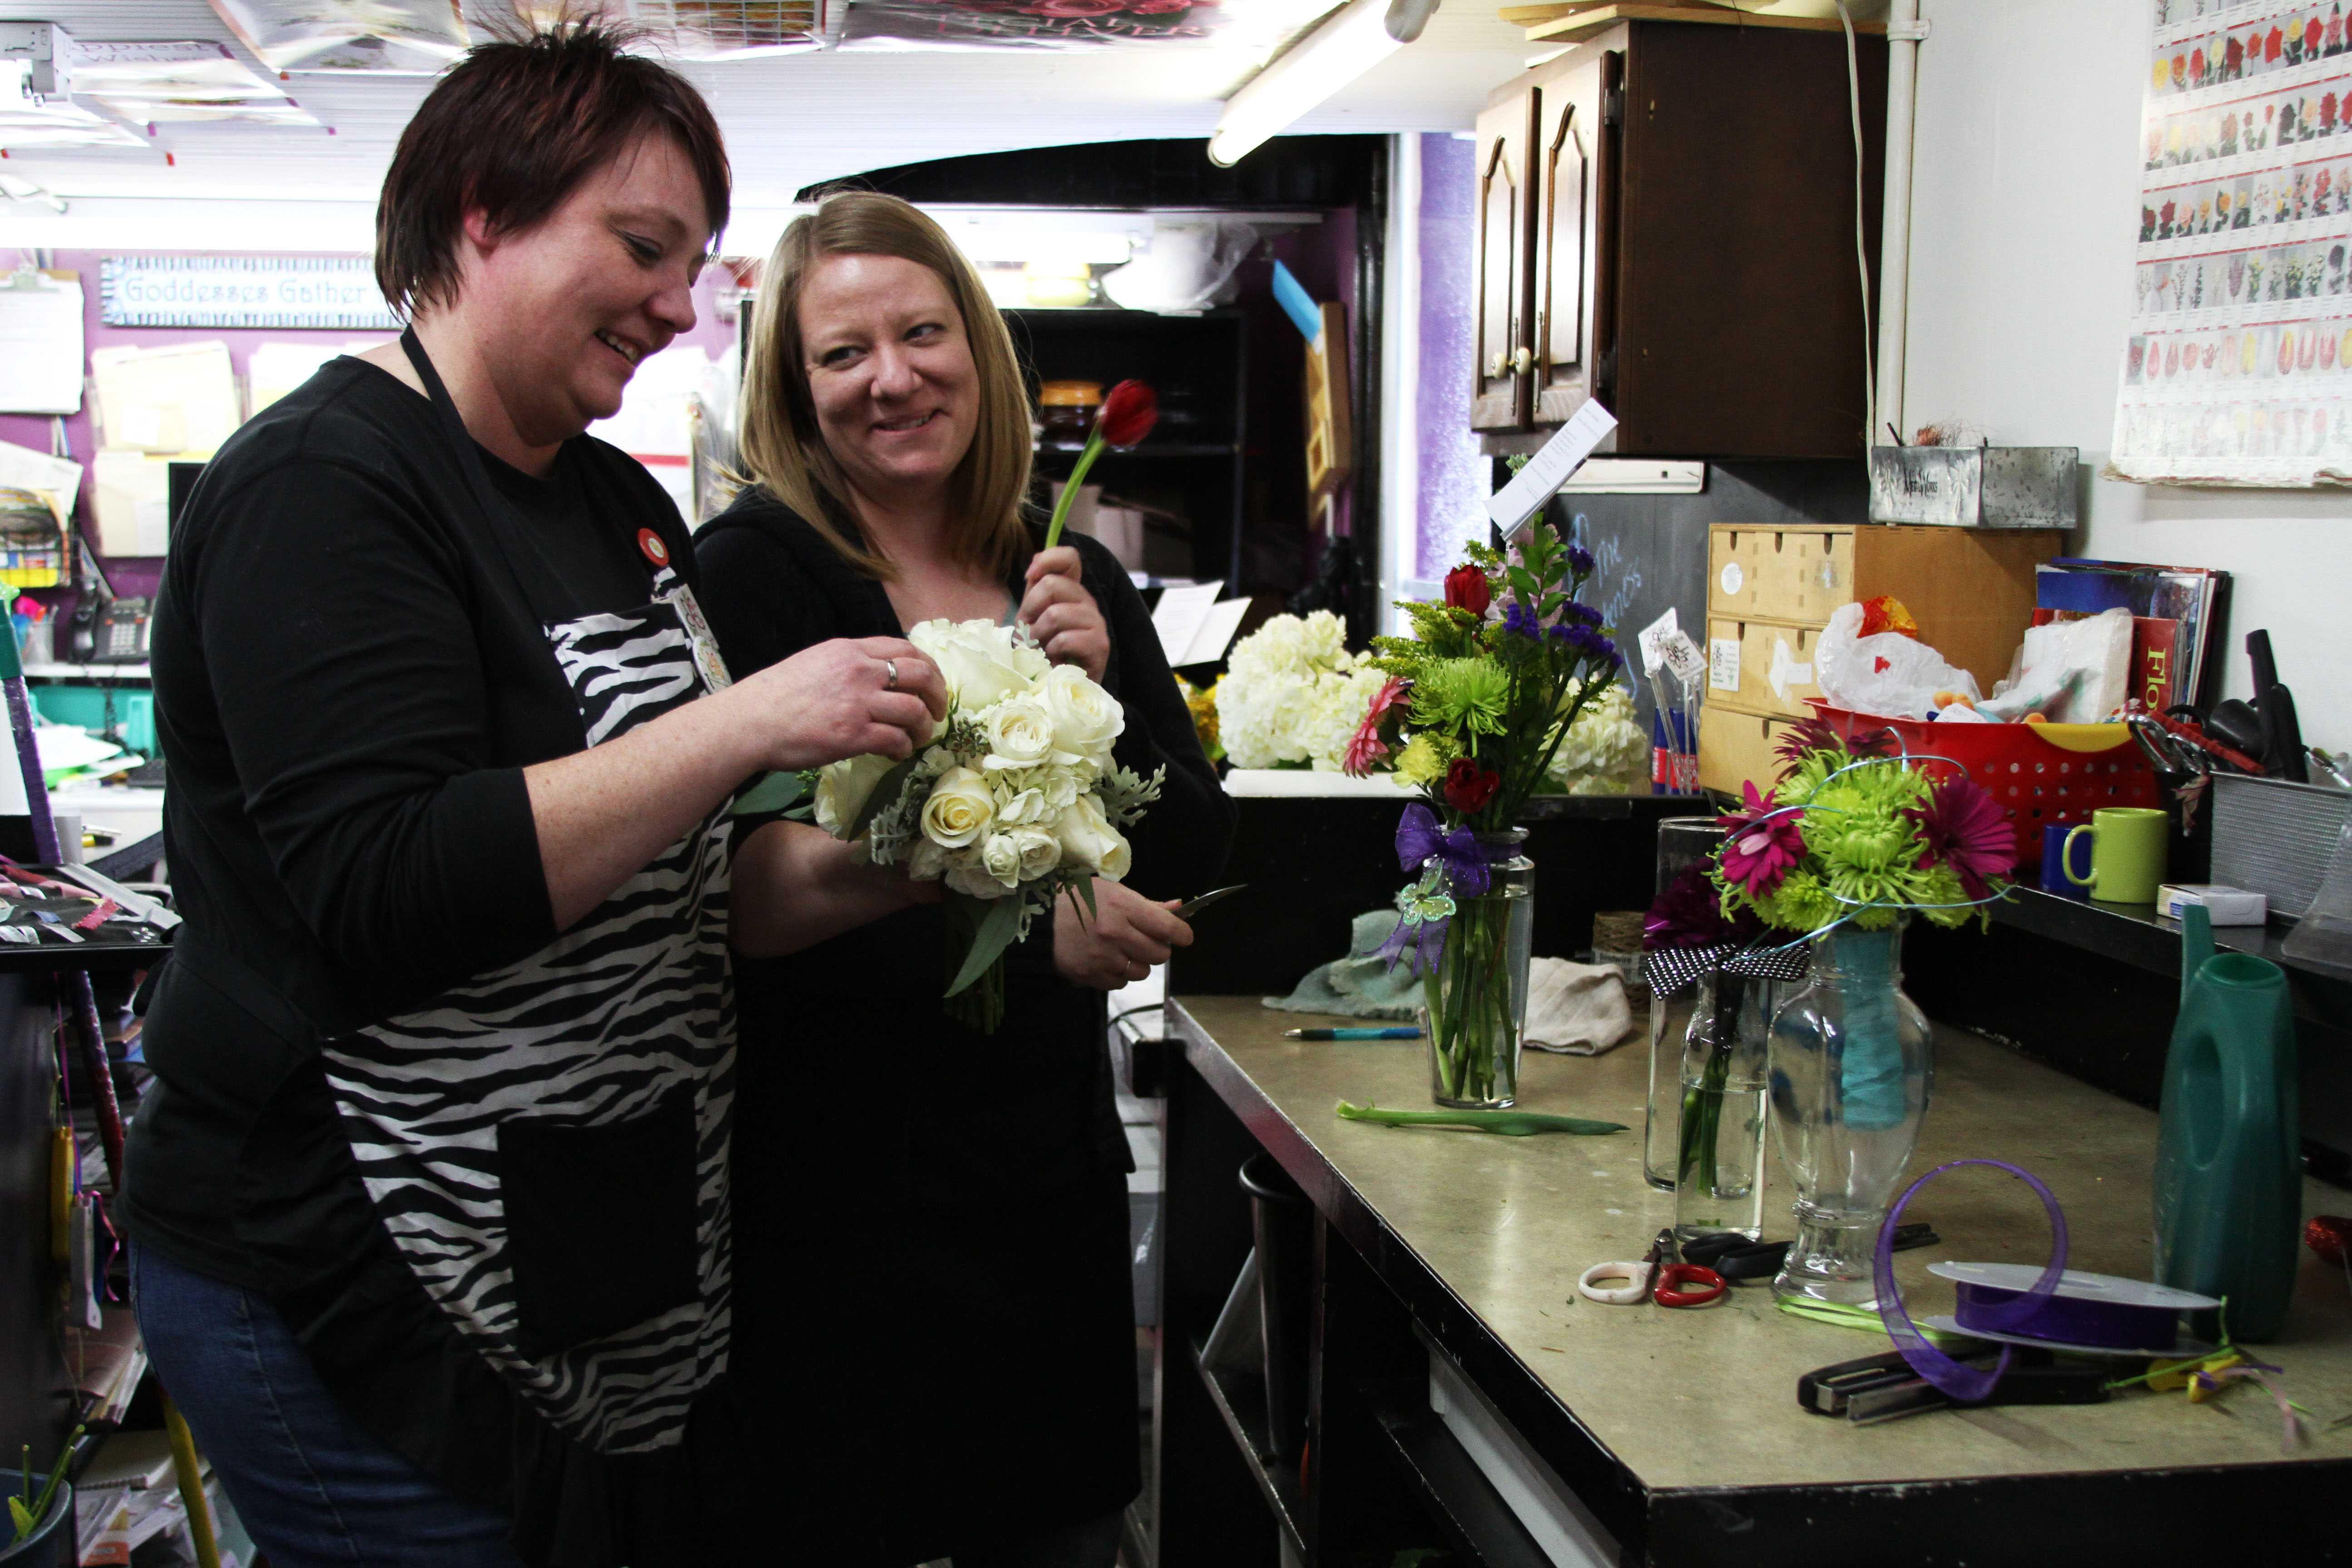 Jody Fairchild-VanDeKrol (right) and sister Charity Fairchild-Kirsch work on a floral arrangement. Photo by Avery Rowlison.